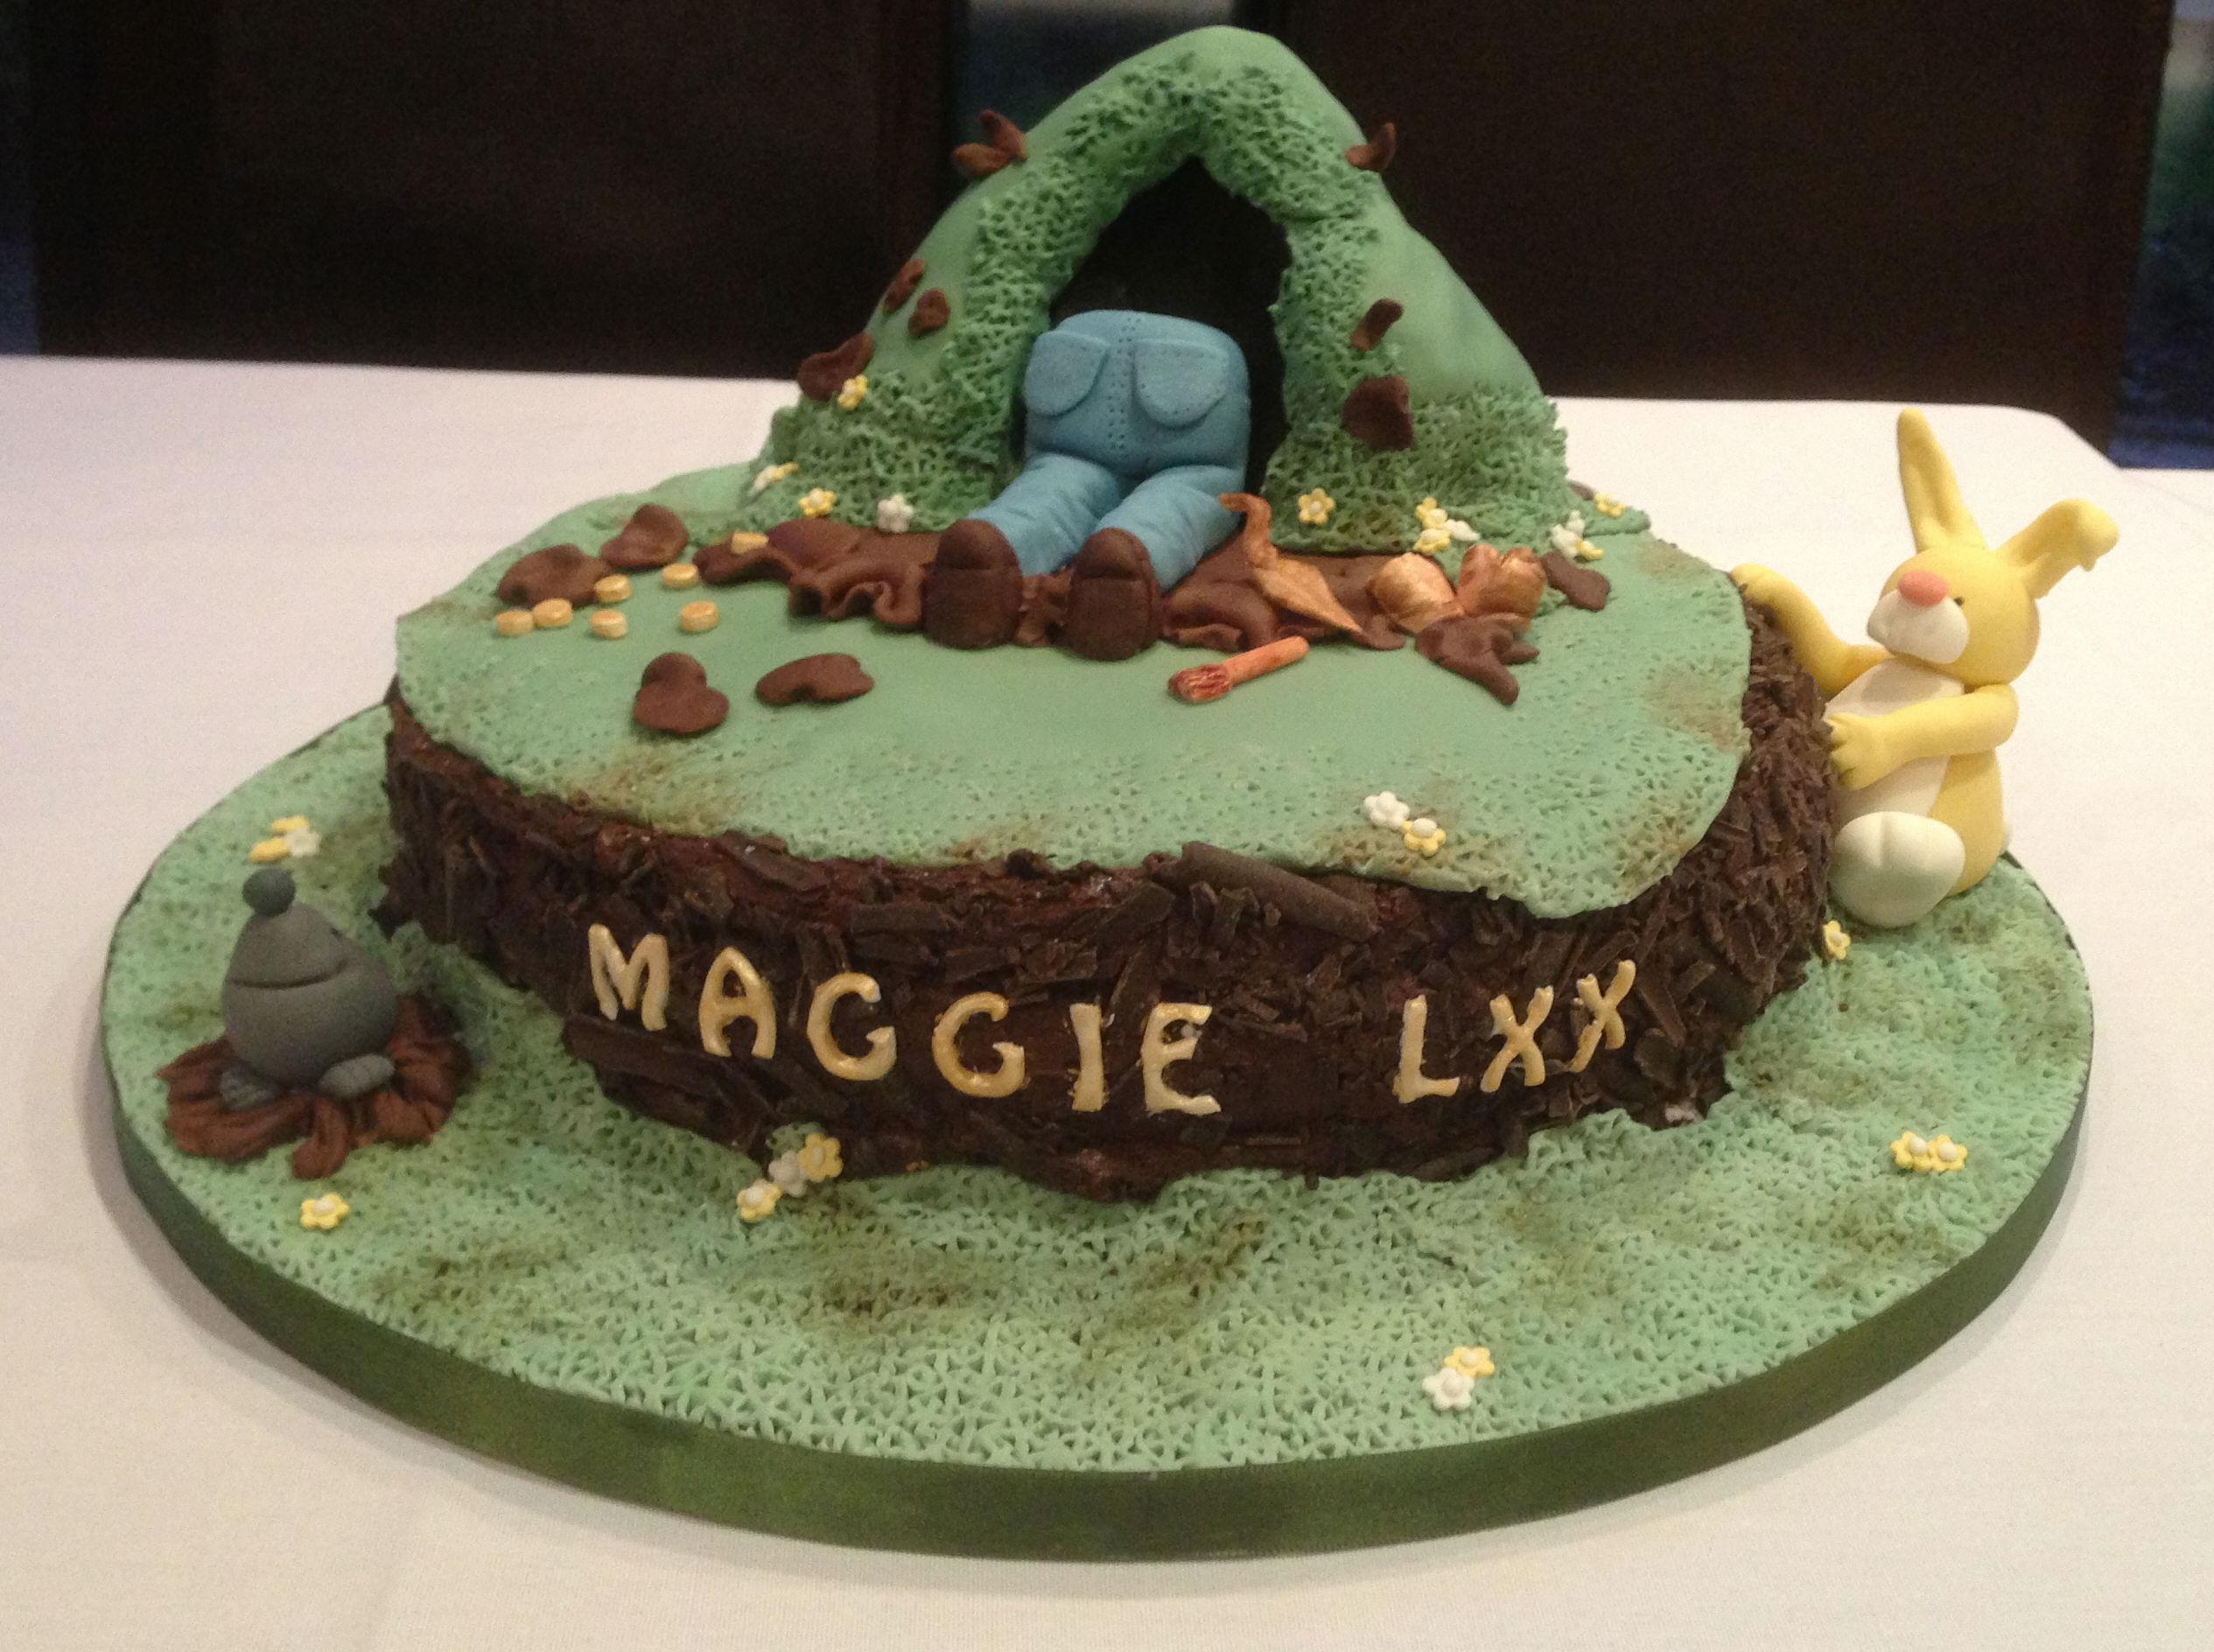 Edible Cake Images Bundaberg : Edible Archaeology: birthday burrowing - Current Archaeology